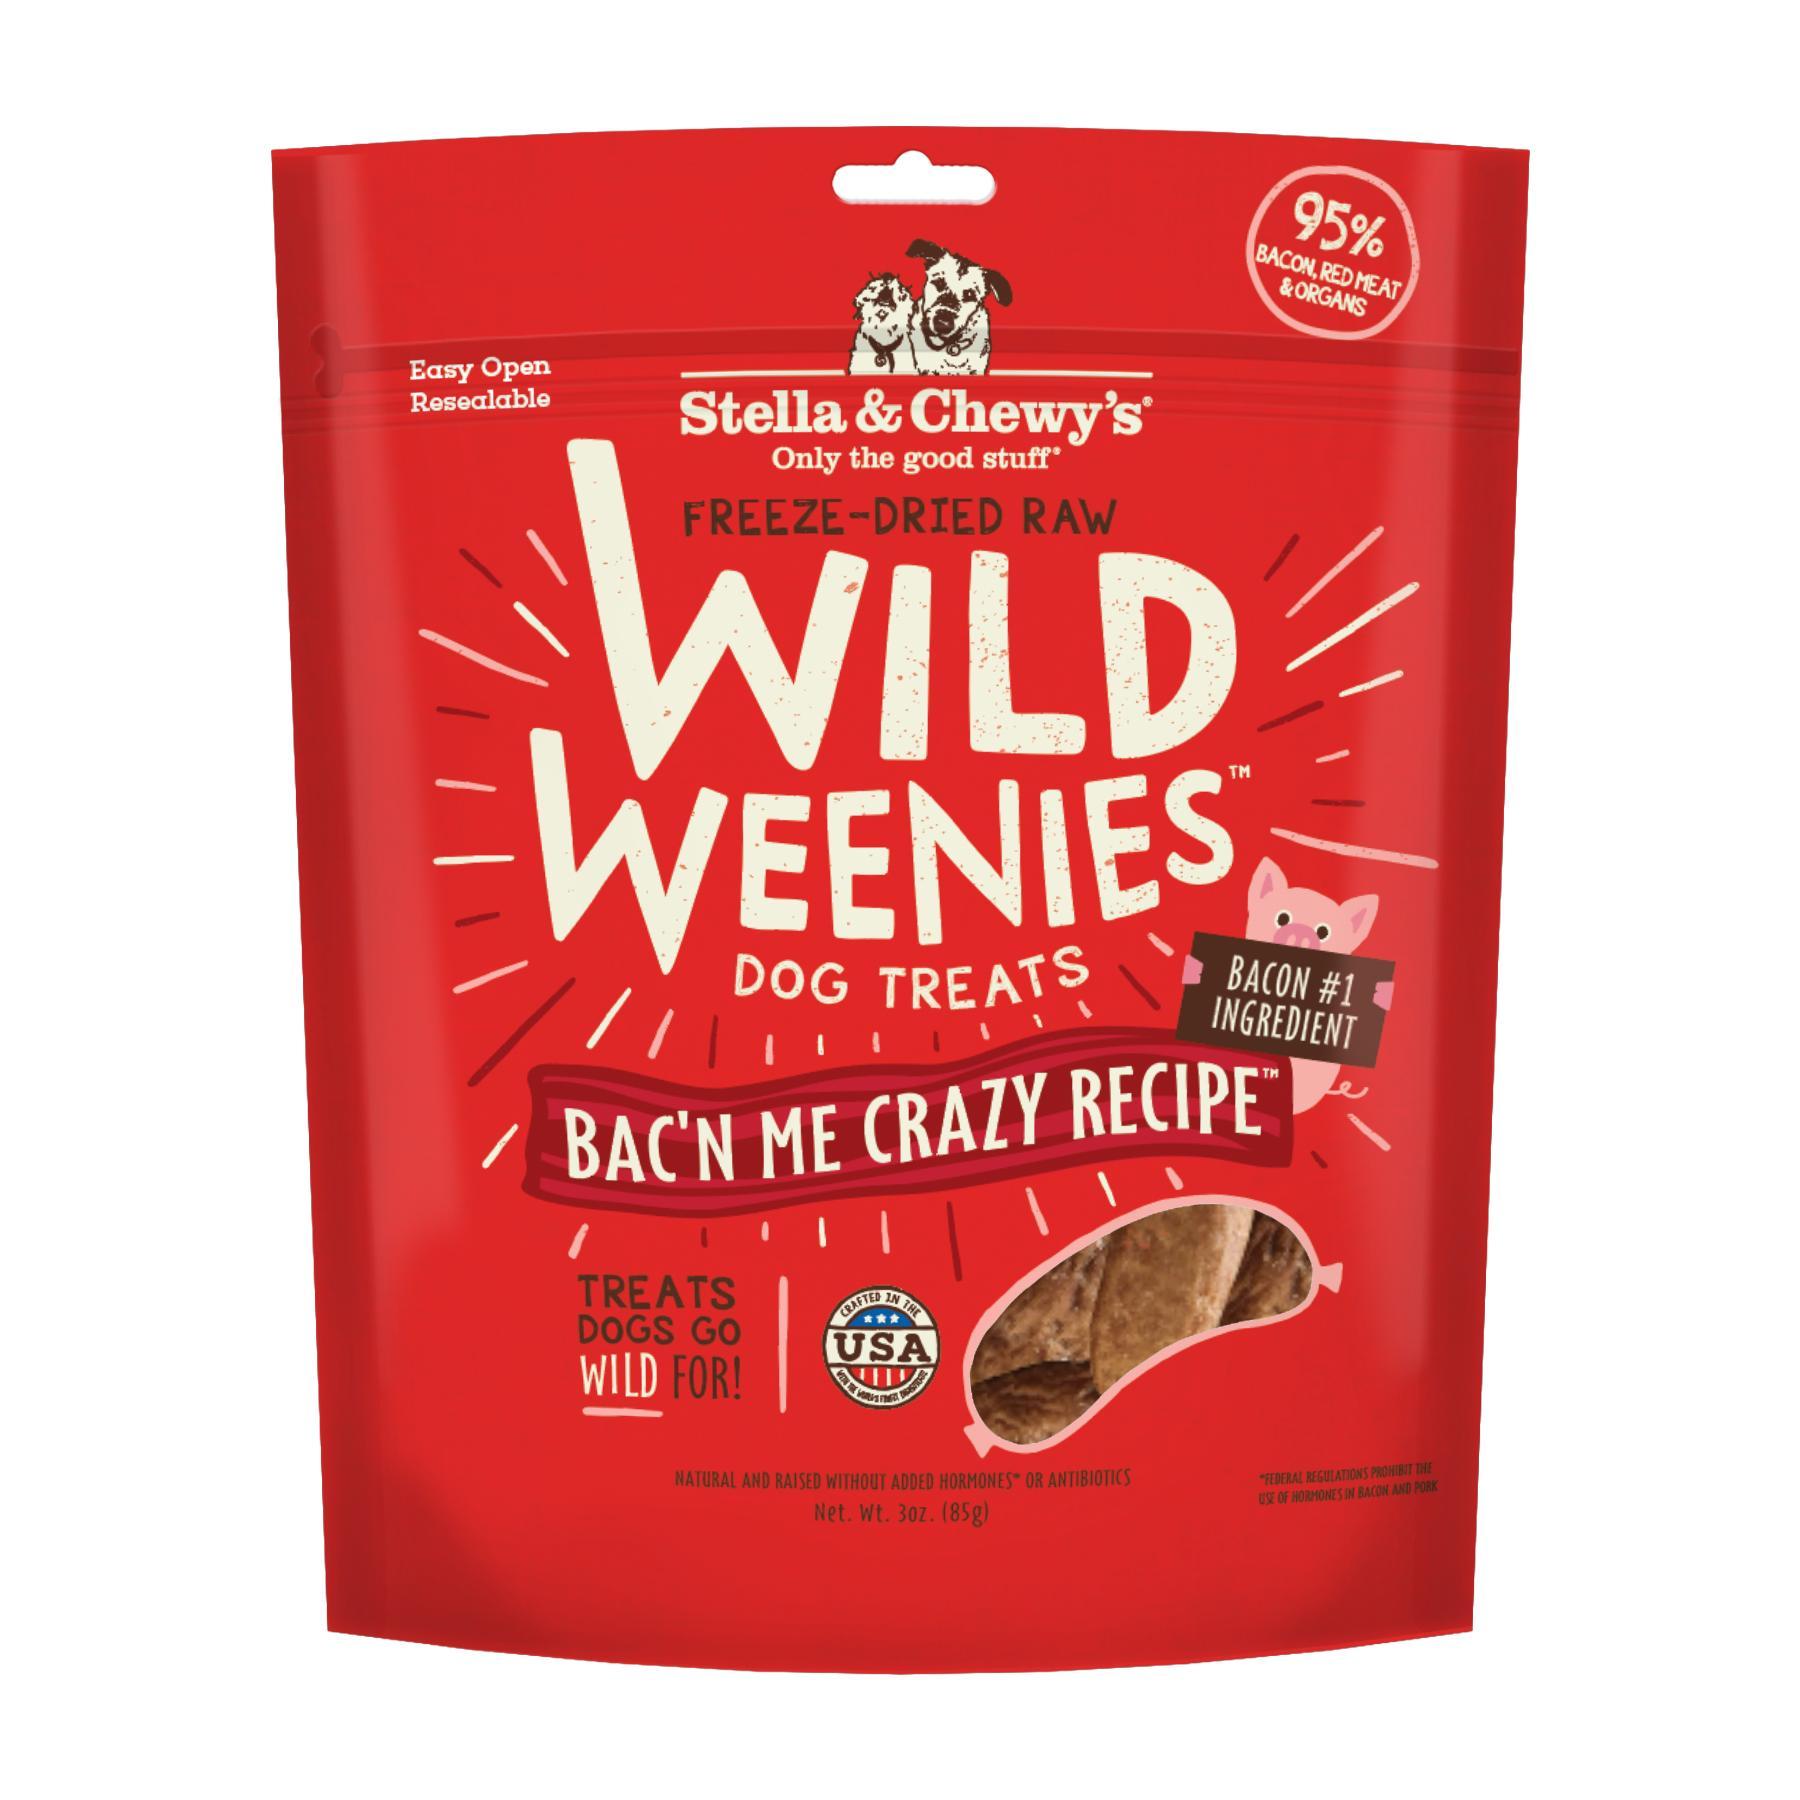 Stella & Chewy's Wild Weenies Bac'n Me Crazy Freeze-Dried Dog Treats Image